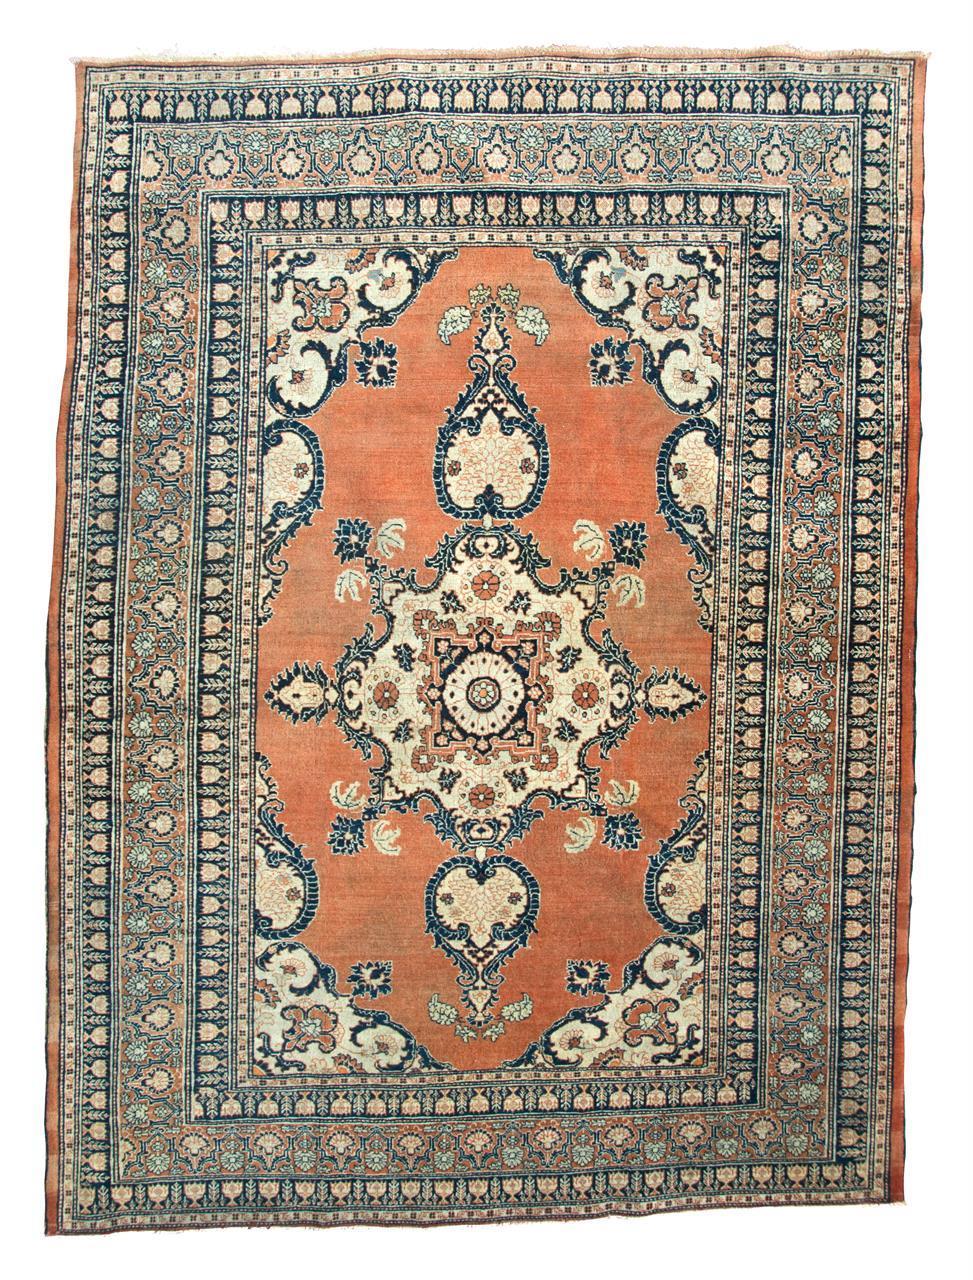 70006 Tabriz hajji jalili 180 x 130